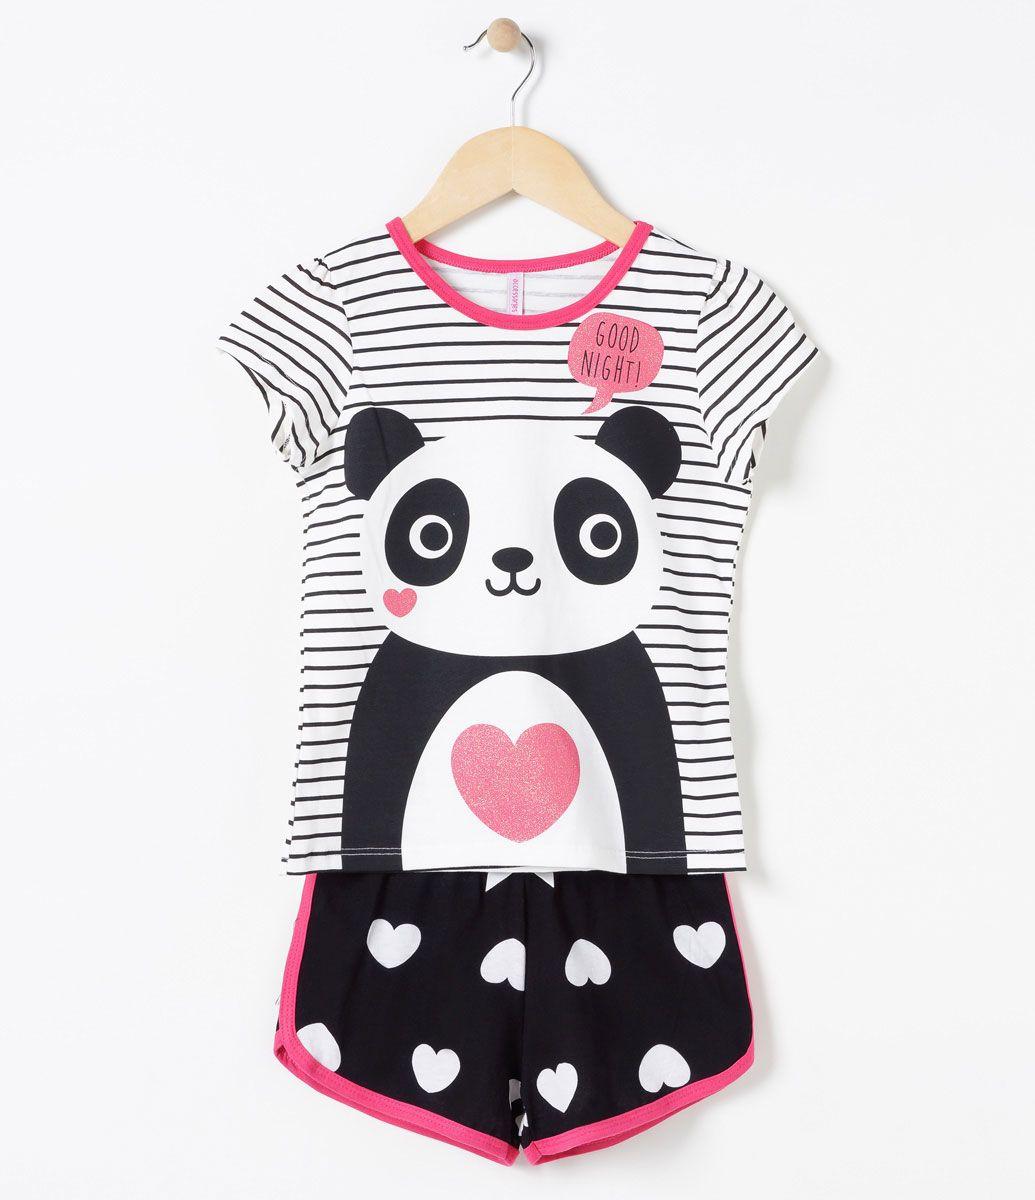 0c7ed76561f95e Pijama infantil Manga curta Gola redonda Estampa de urso panda Marca ...